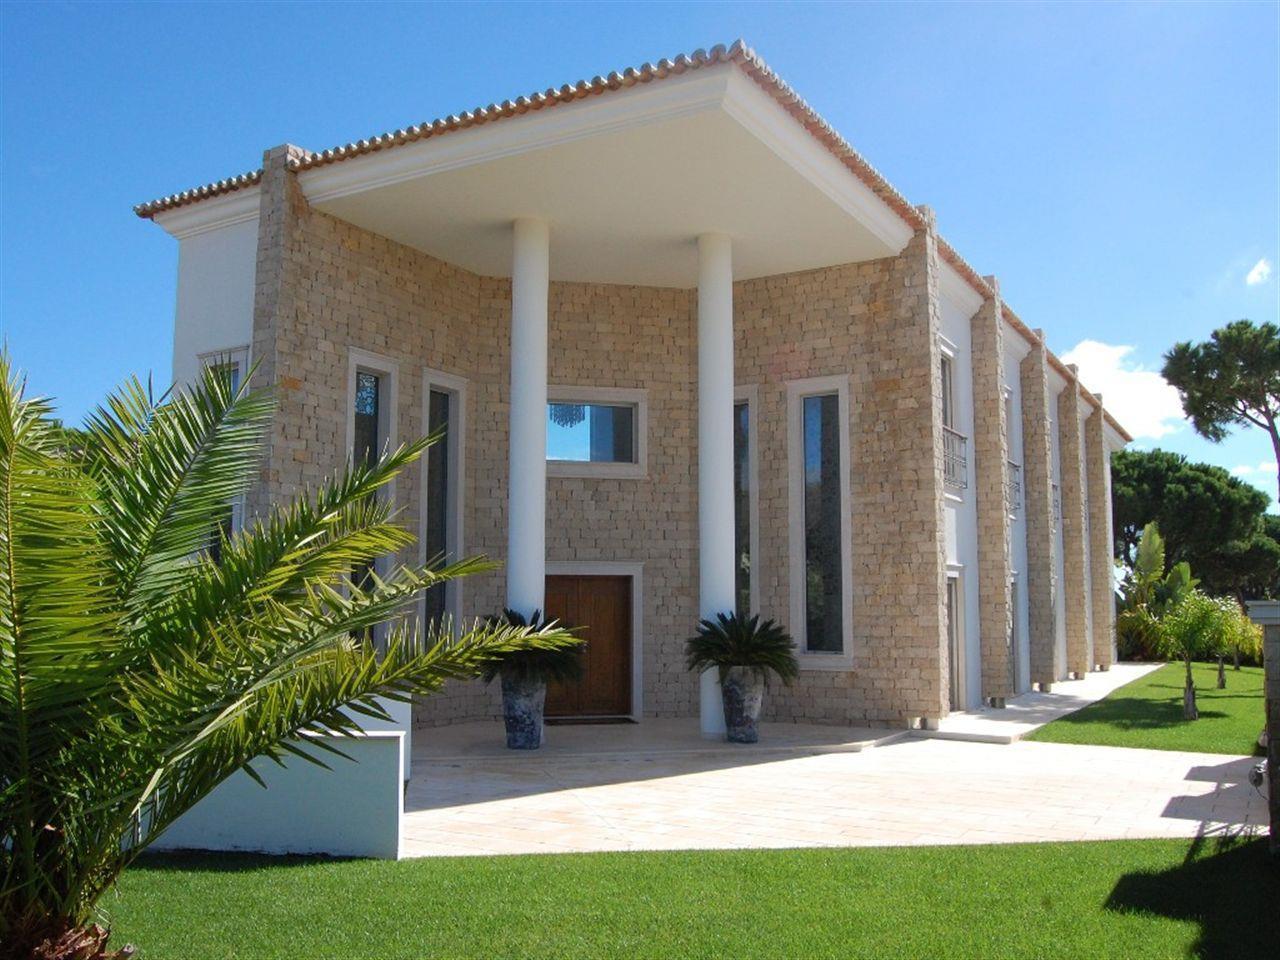 Moradia para Venda às Detached house, 4 bedrooms, for Sale Loule, Algarve Portugal